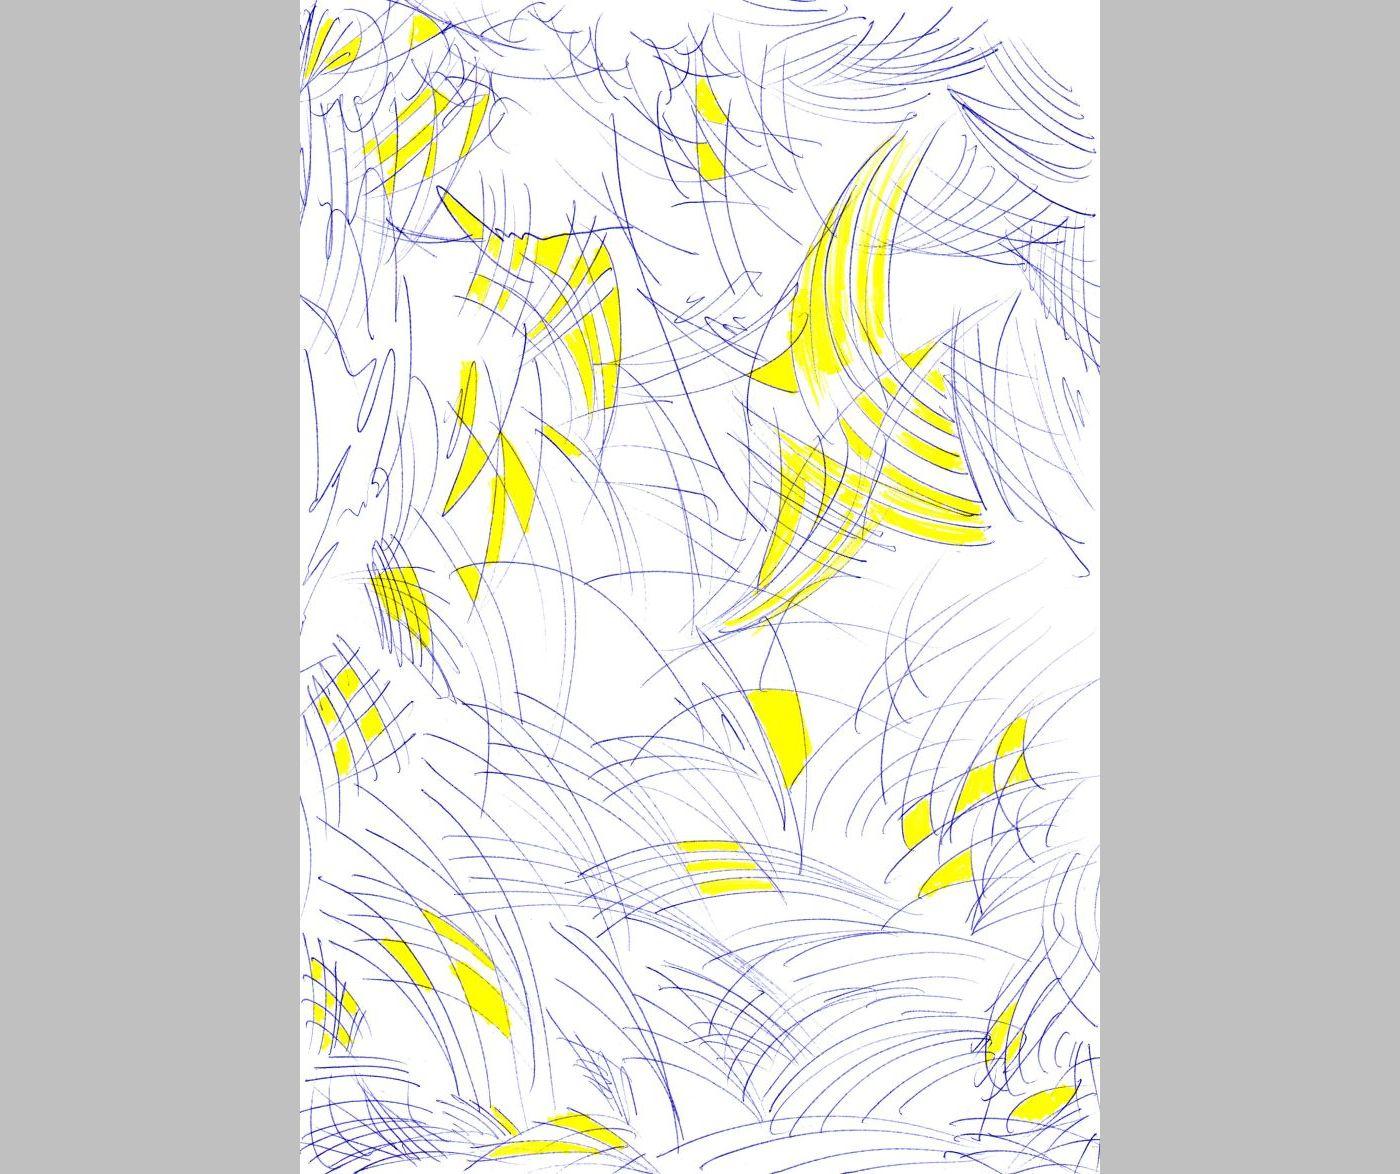 Ohne Titel (15.06.2016, 21 x 29,7 cm, A4)